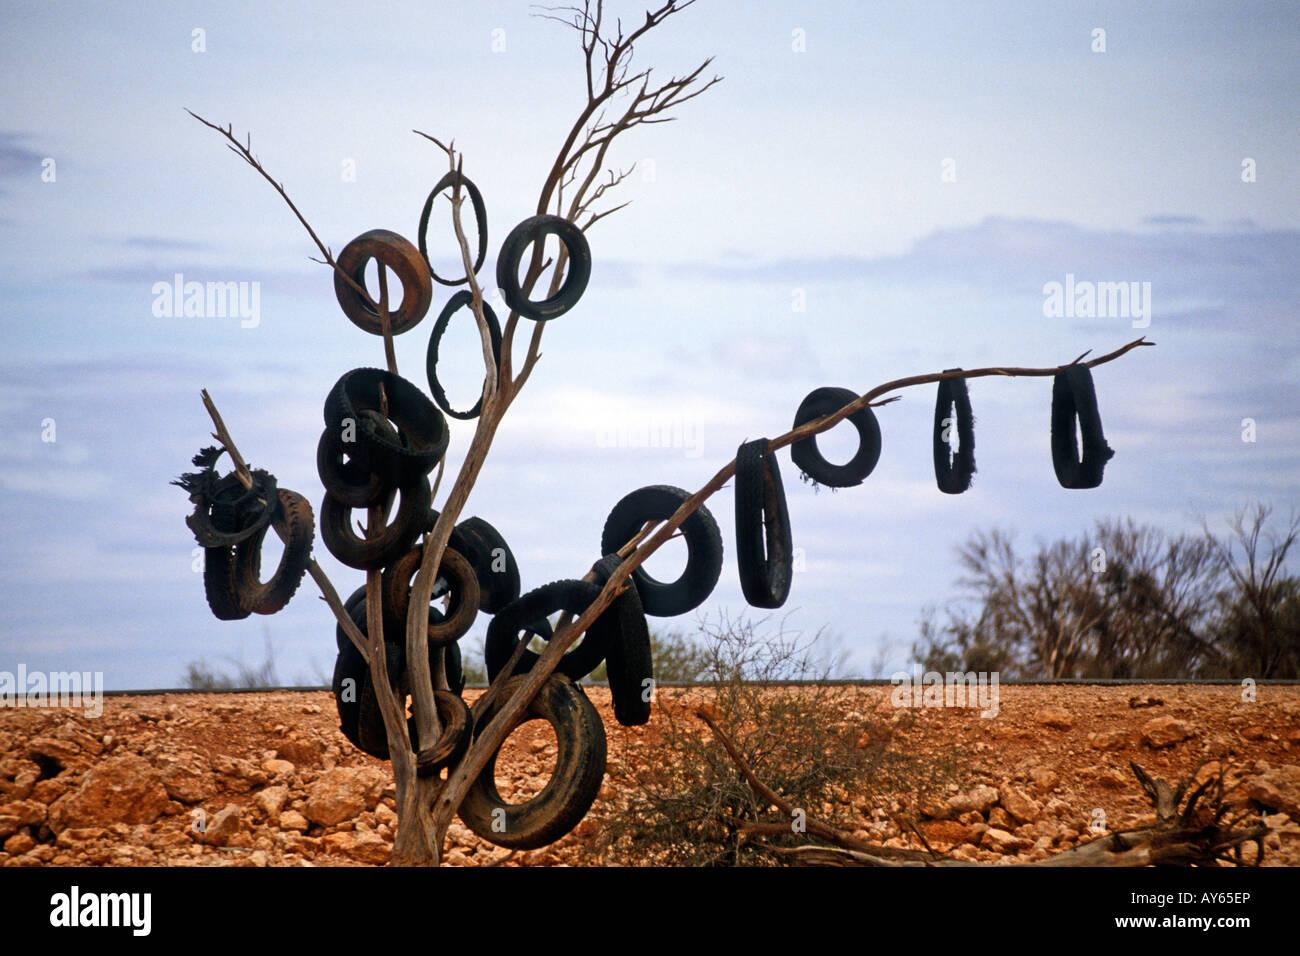 Australia Near Alice Springs Old tyres adorn a tree - Stock Image